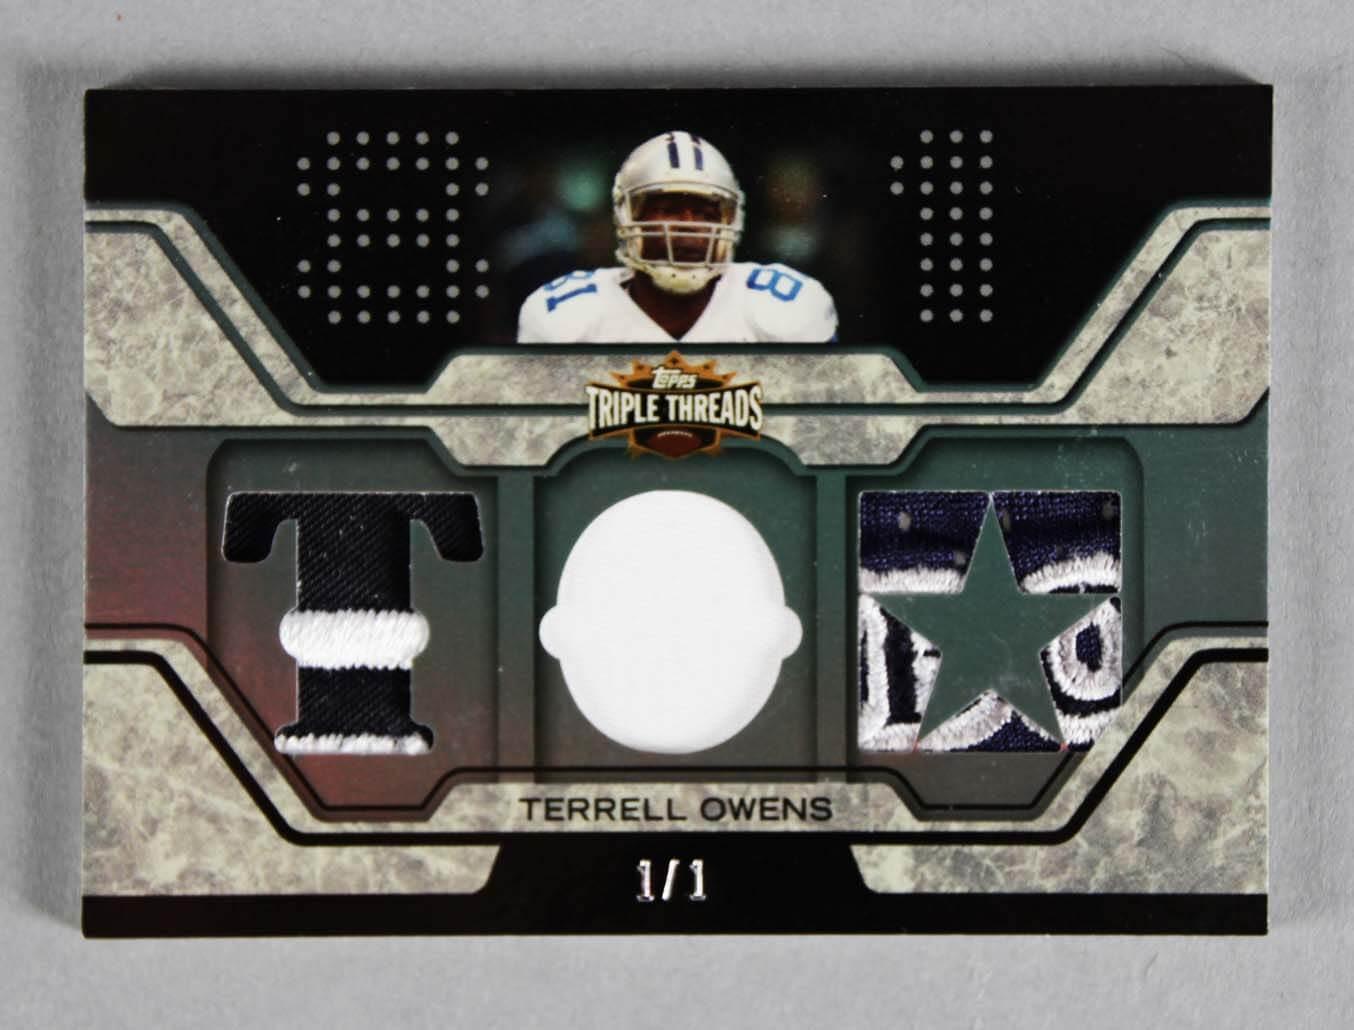 2008 Topps Terrell Owens Football Card  c1ced6267